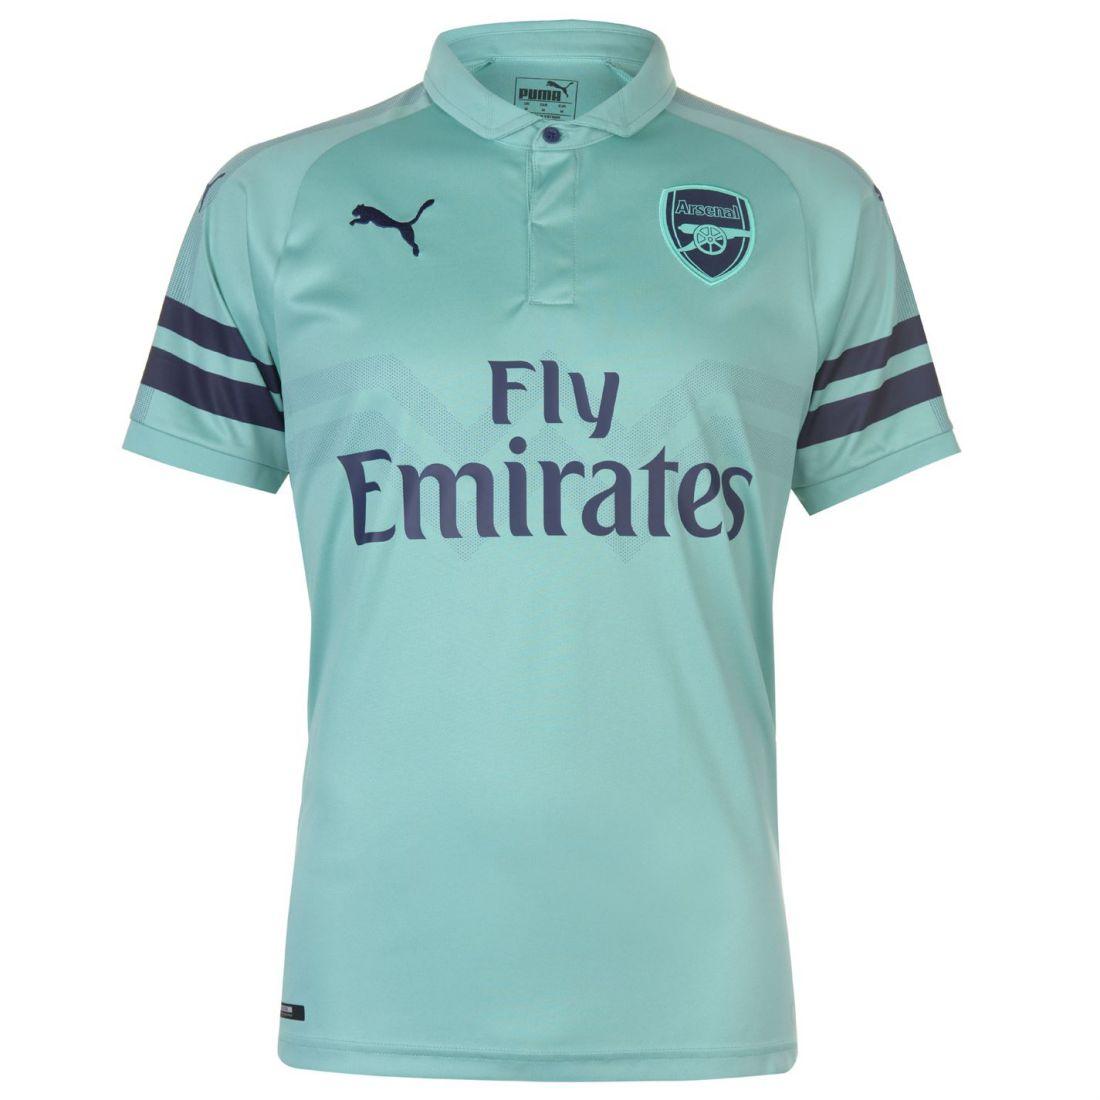 a18eece49 Retro Arsenal Shirts Ebay - Nils Stucki Kieferorthopäde